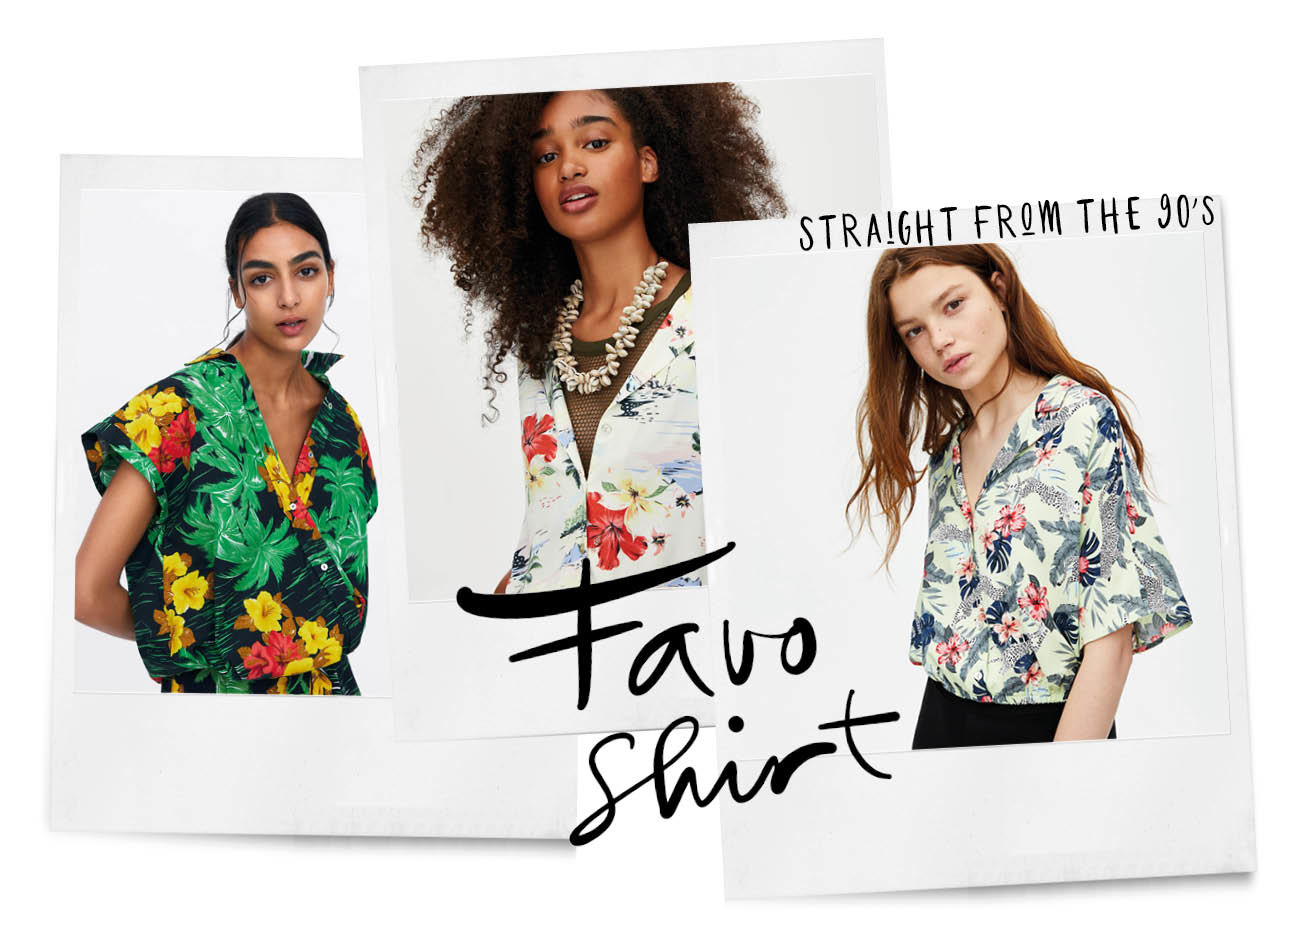 hawai t-shirt Zara vrouwen modellen zomers